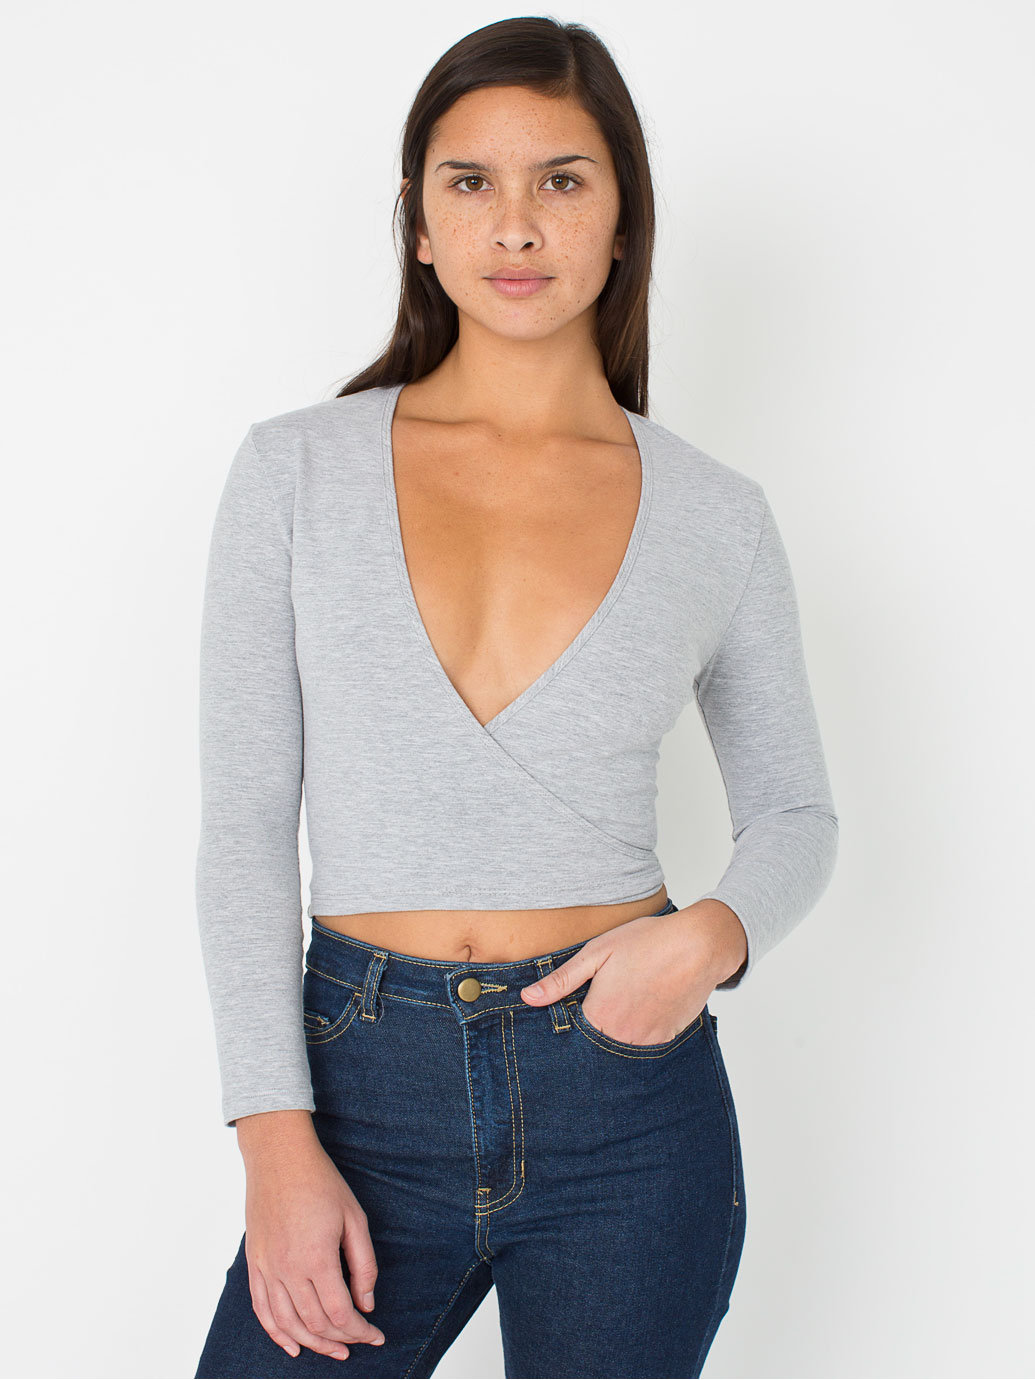 Cotton spandex julliard top